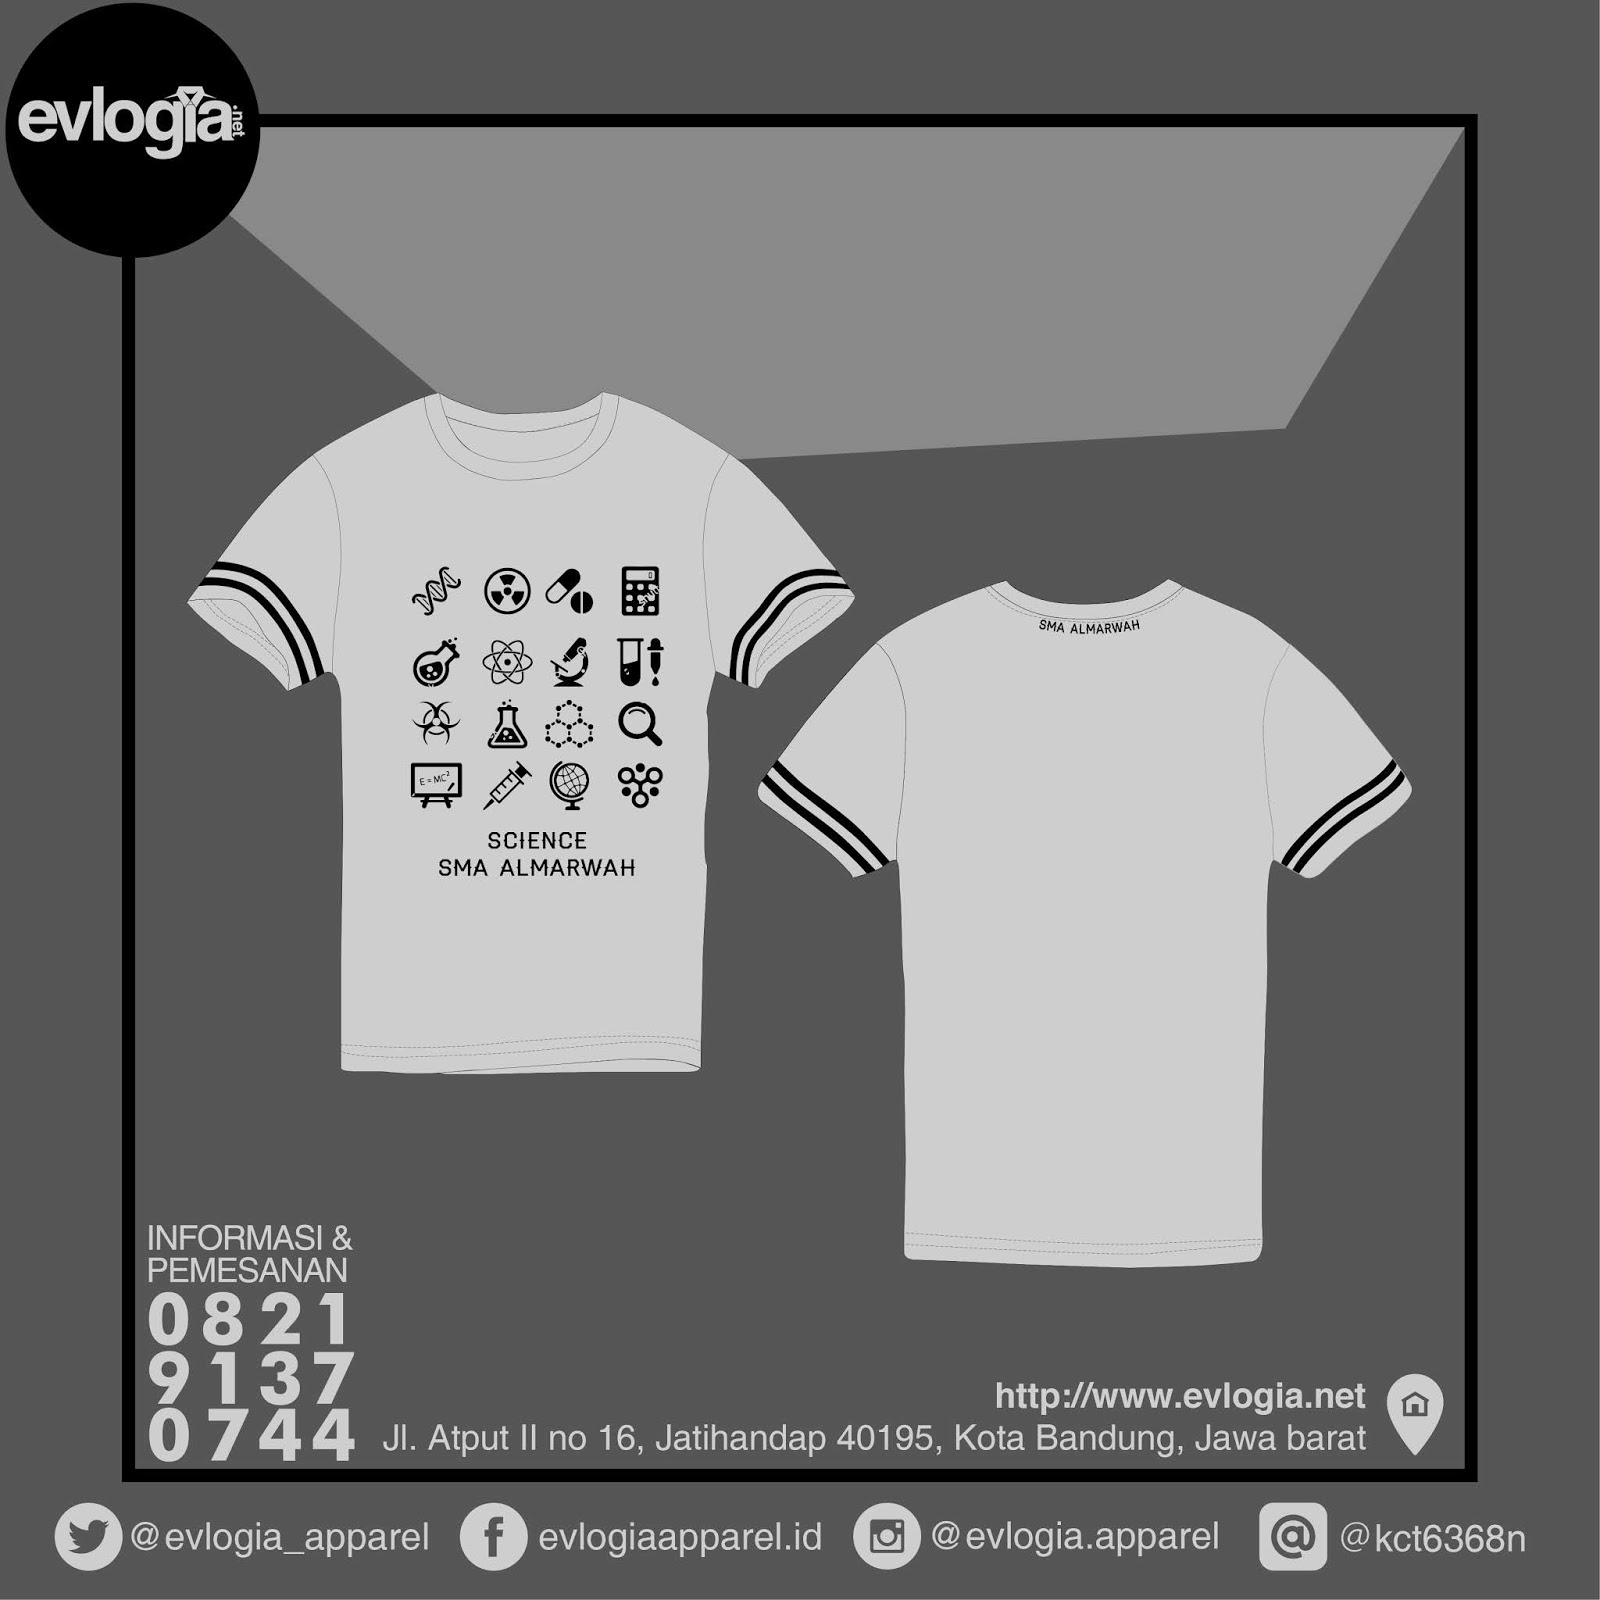 Bikin Kaos / Baju Murah Berkualitas Bandung - Model Anak Sekolah